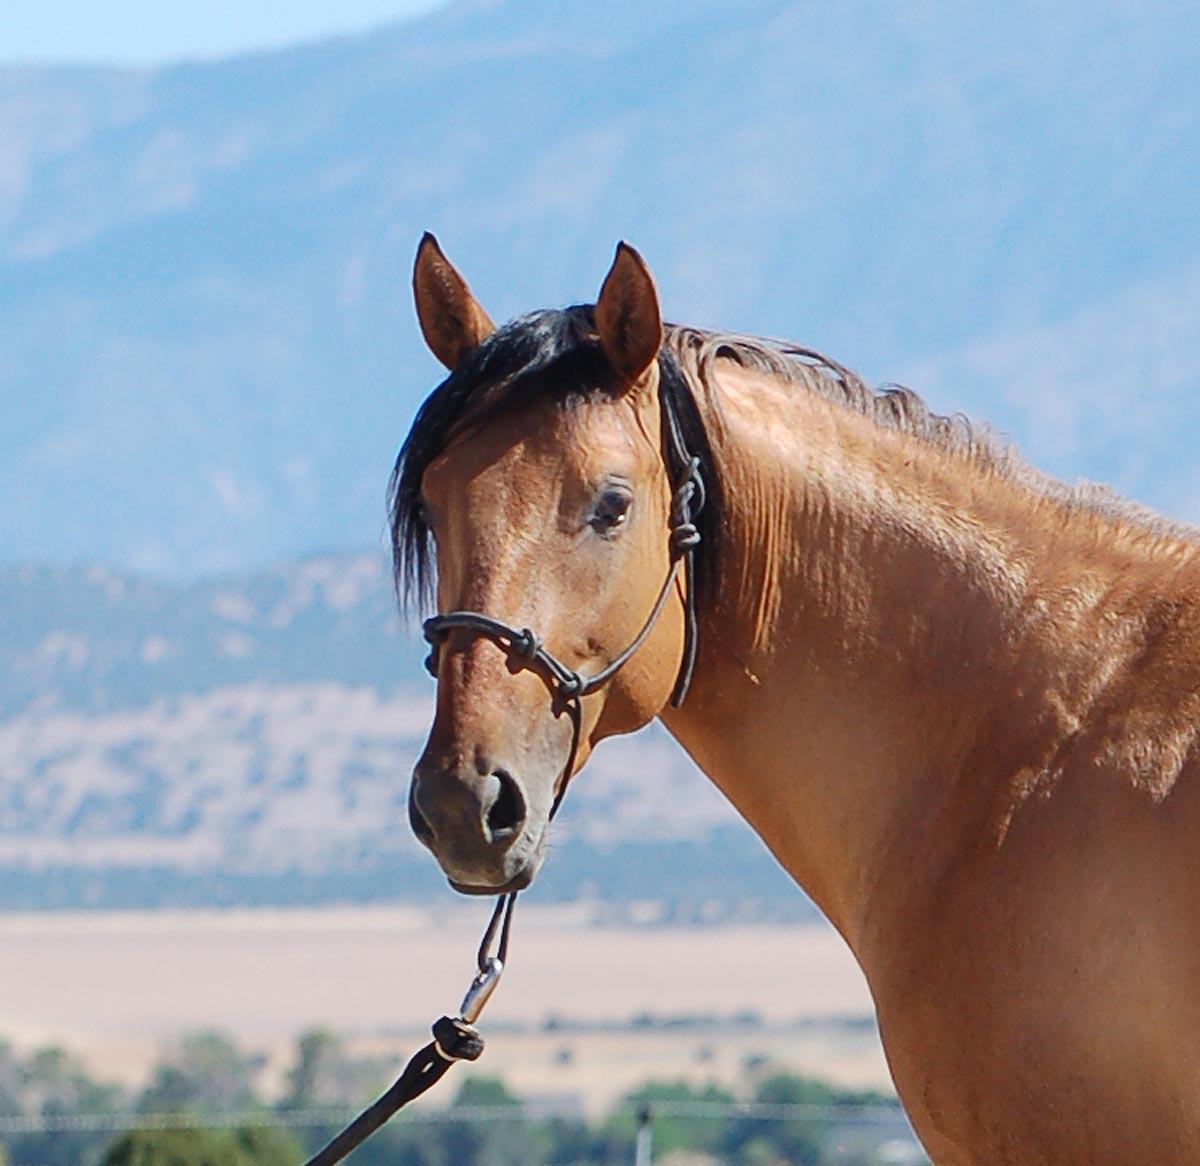 Jaz Ranch Ameritano stallion